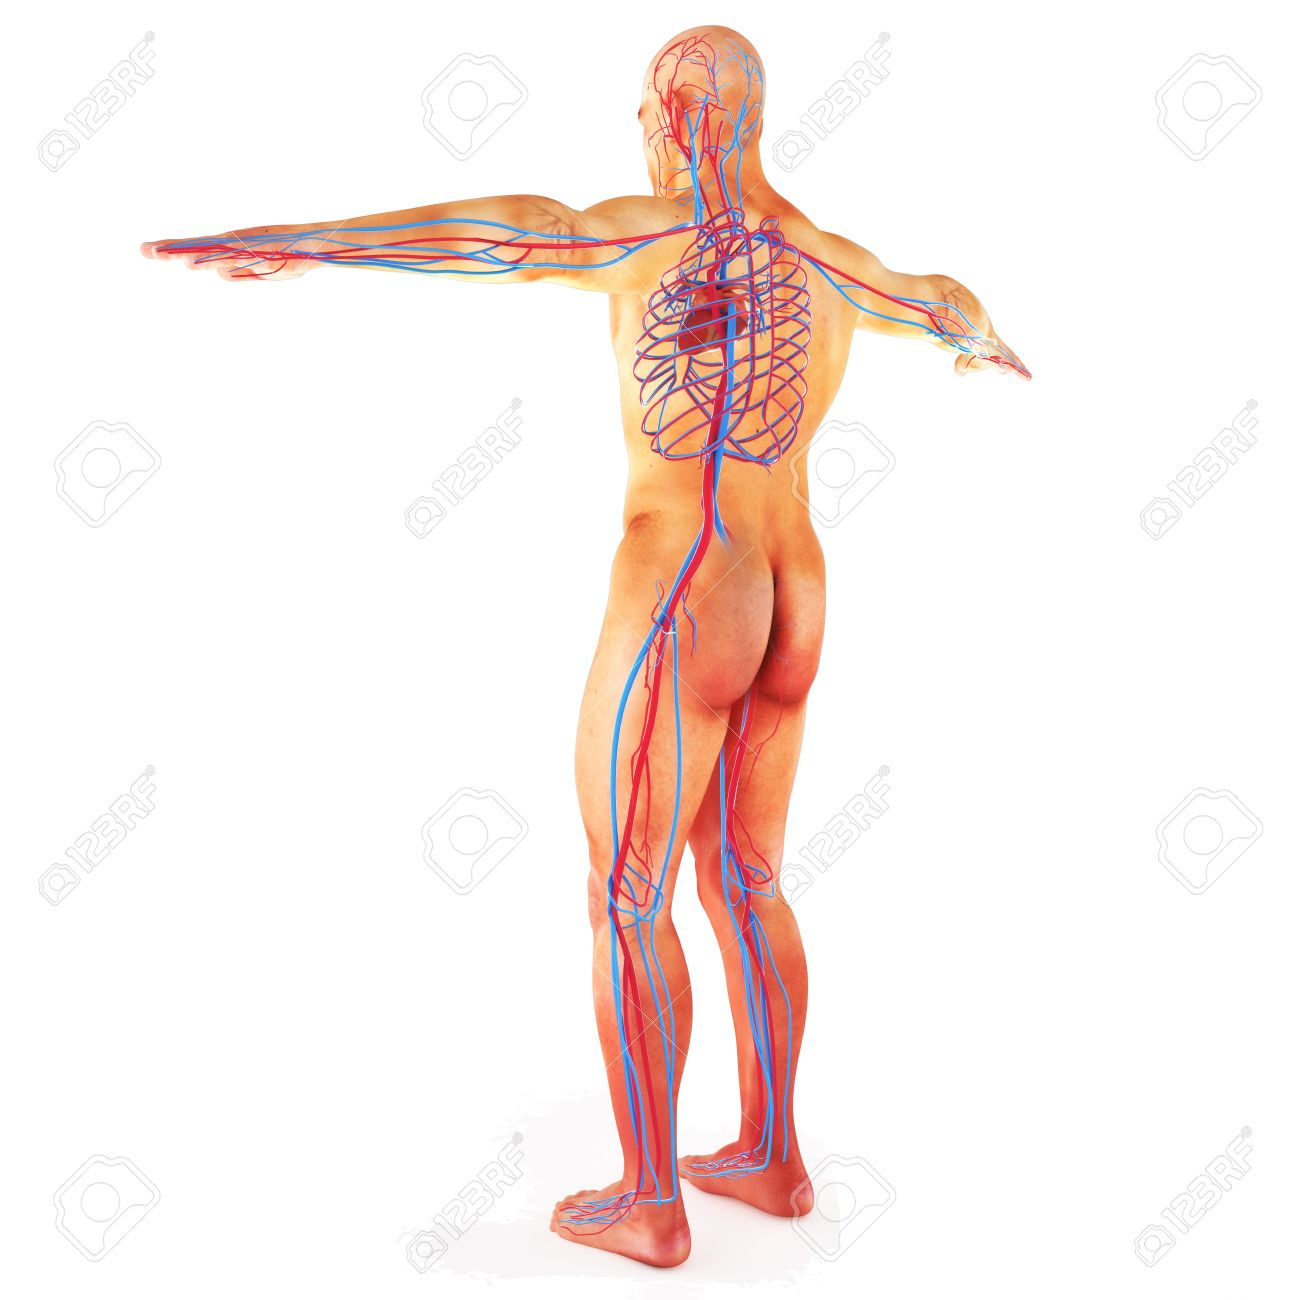 Male Human Circulatory System Blood Circulation On A White